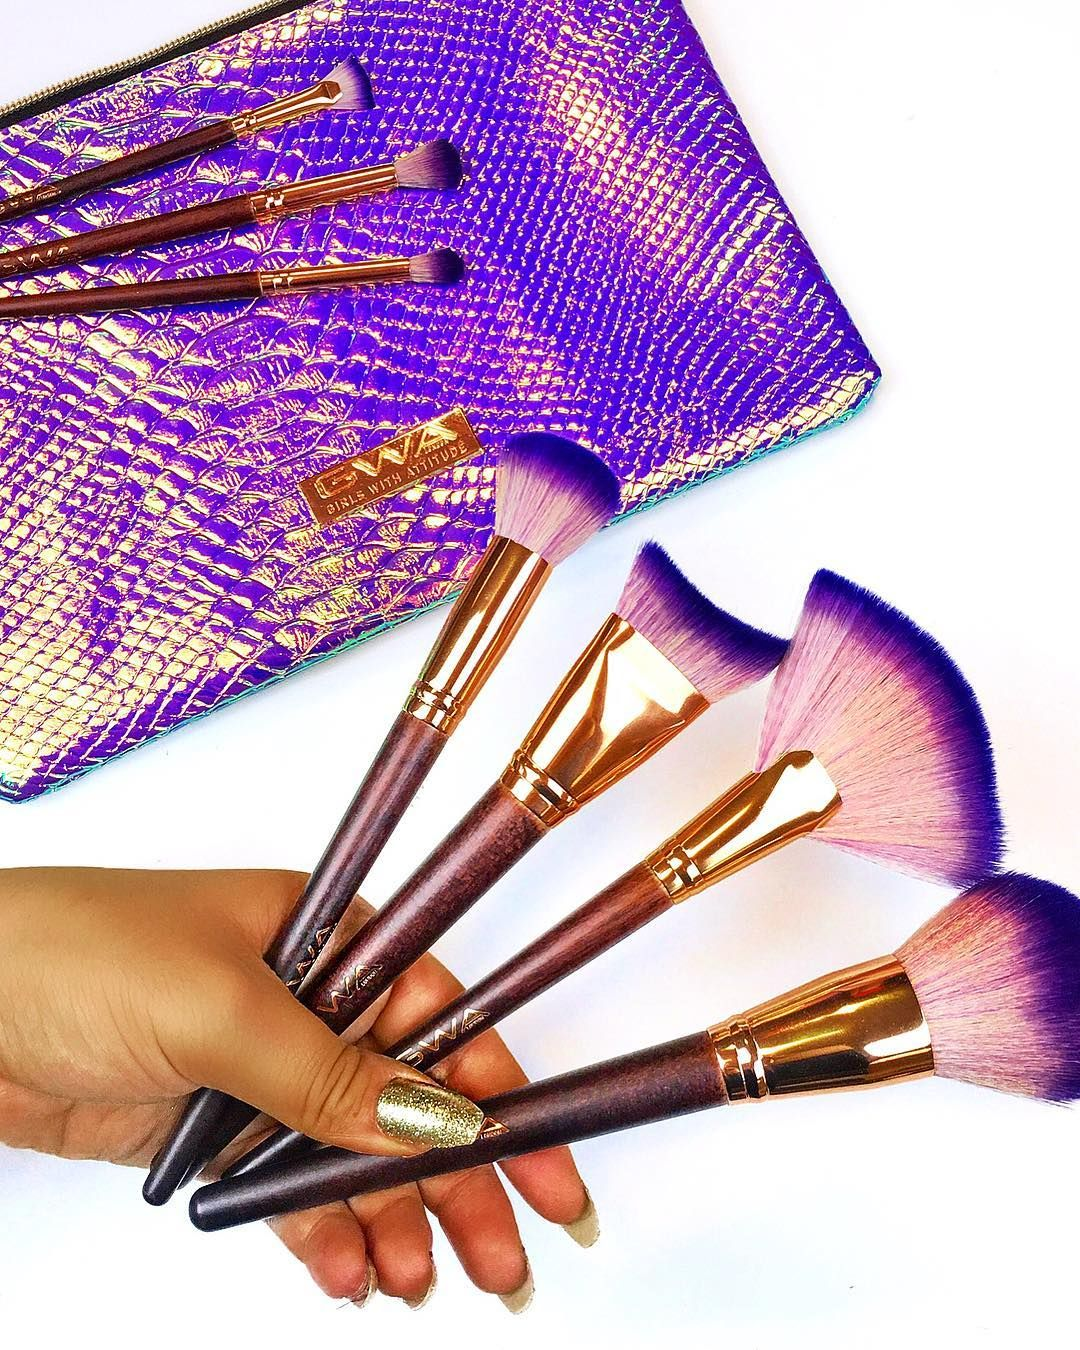 Fairytale Collection Vol. 3 17pcs Makeup Brush Set With